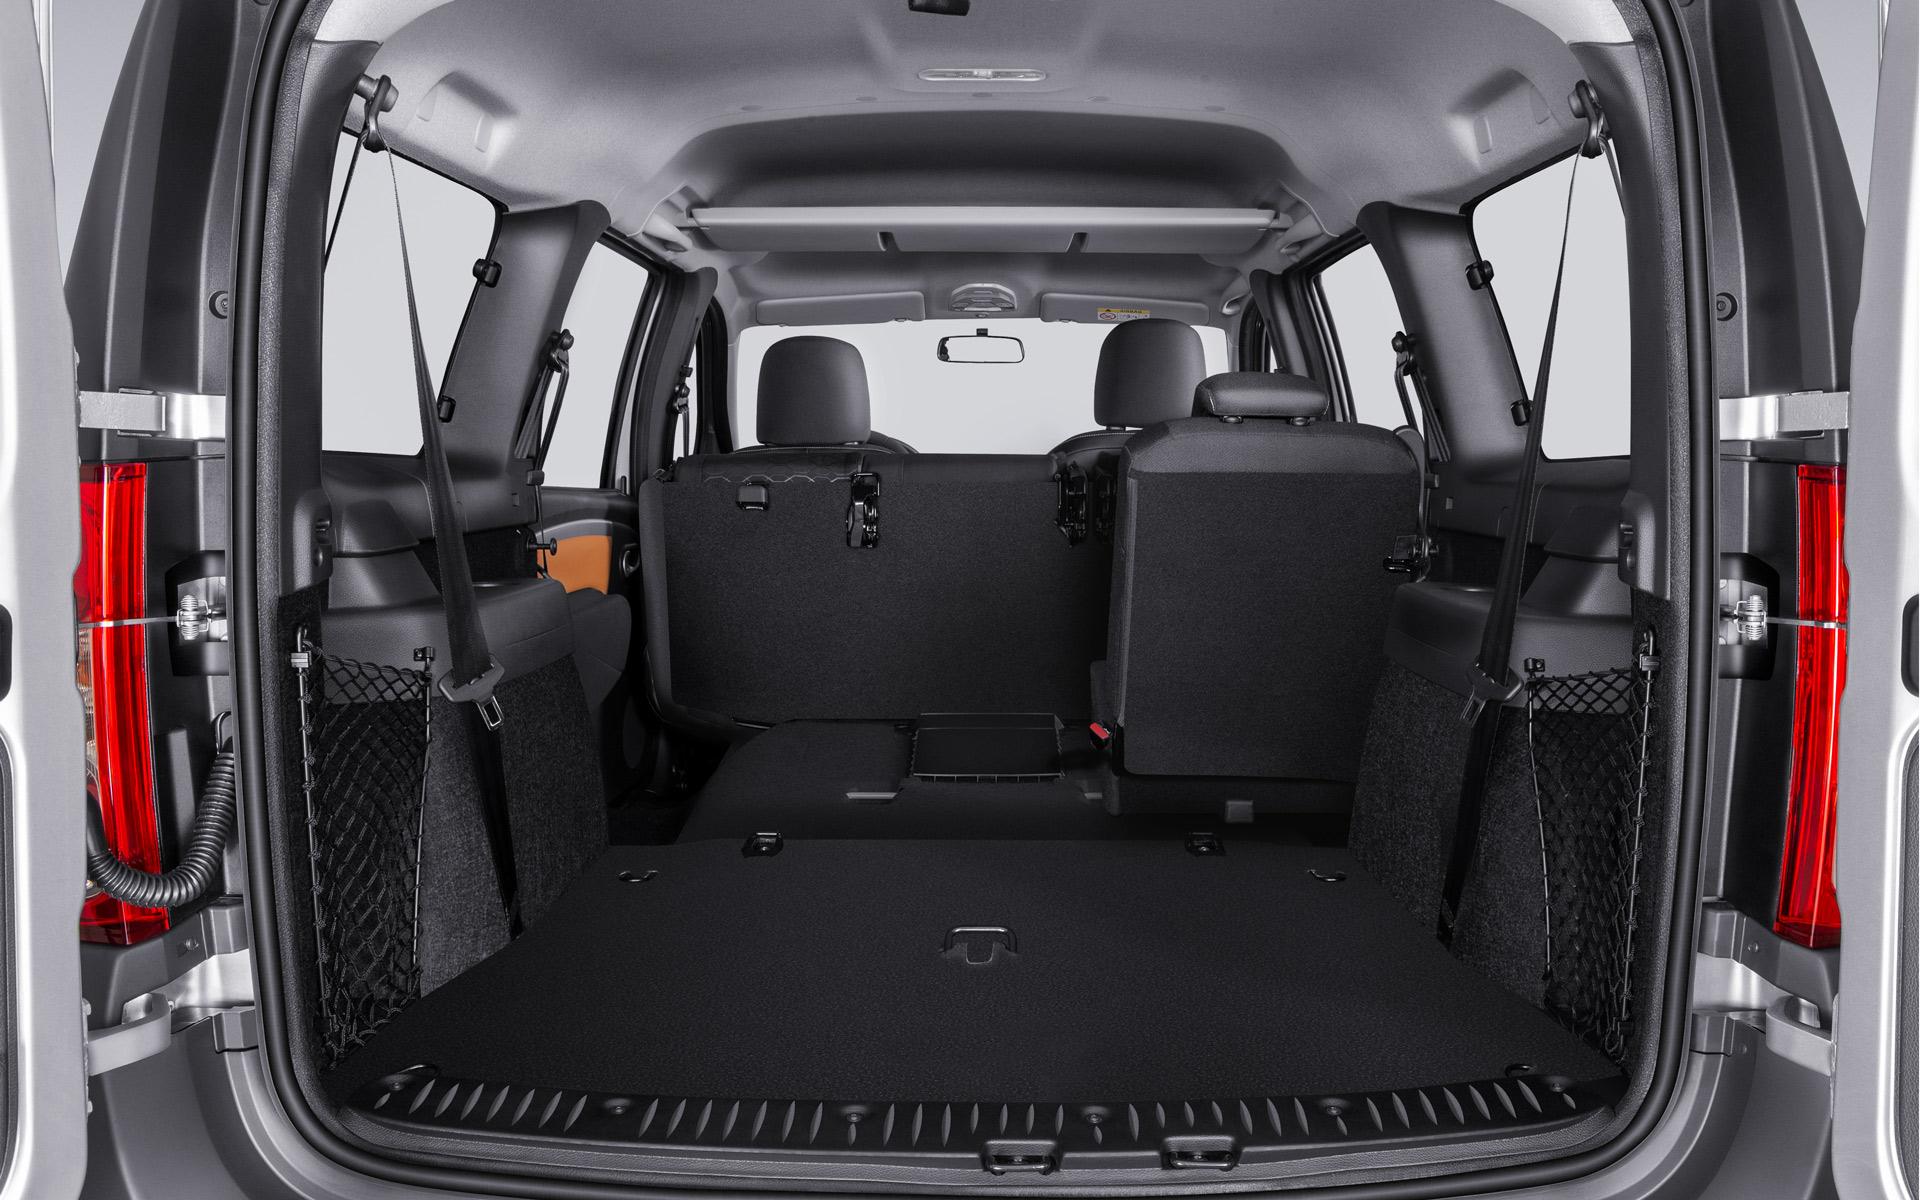 Фотографии багажника нового Лада Ларгус 2021